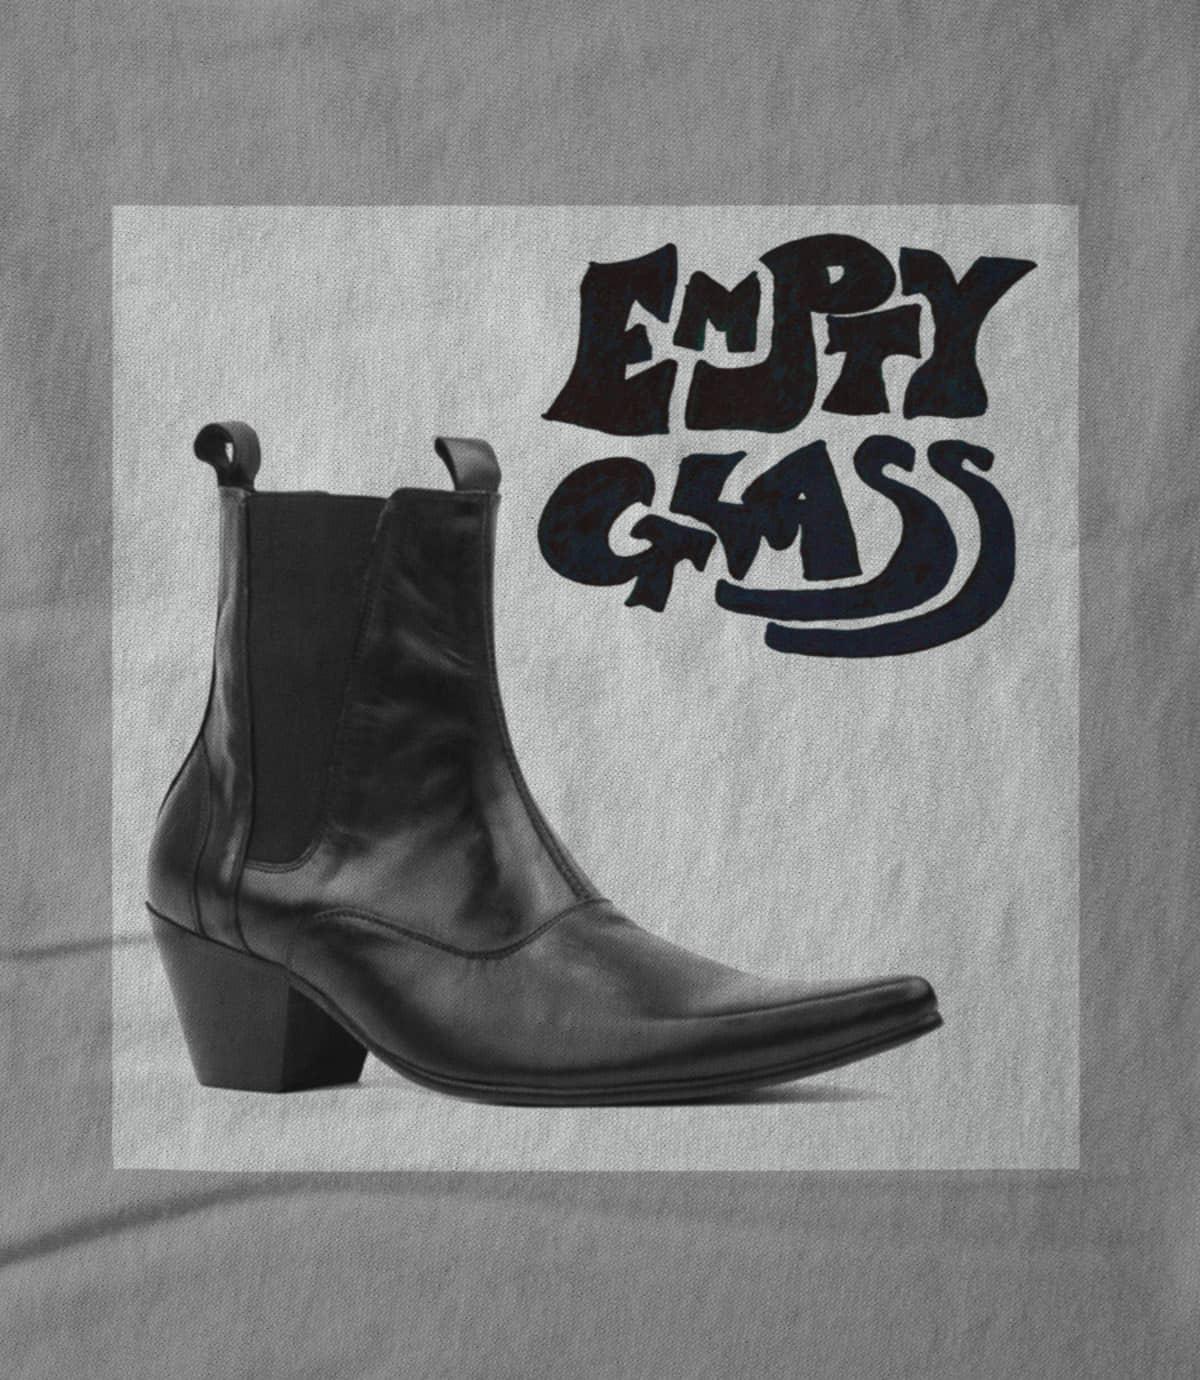 Empty glass boot   grey 1473083400